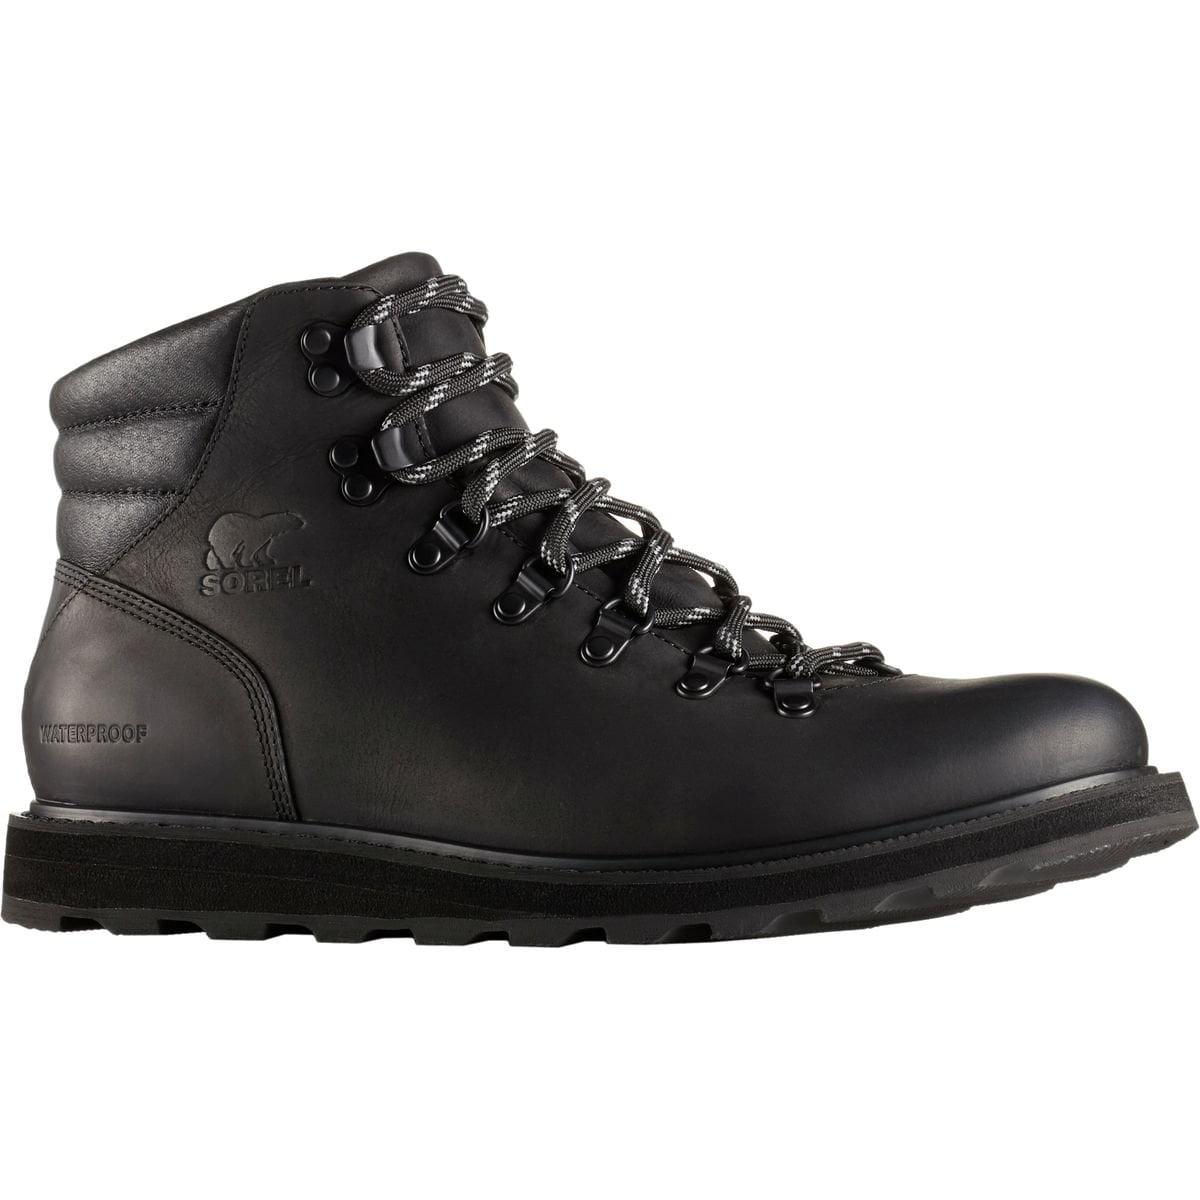 SOREL Madson Hiker Waterproof Men's Waterproof Boots Black (13)